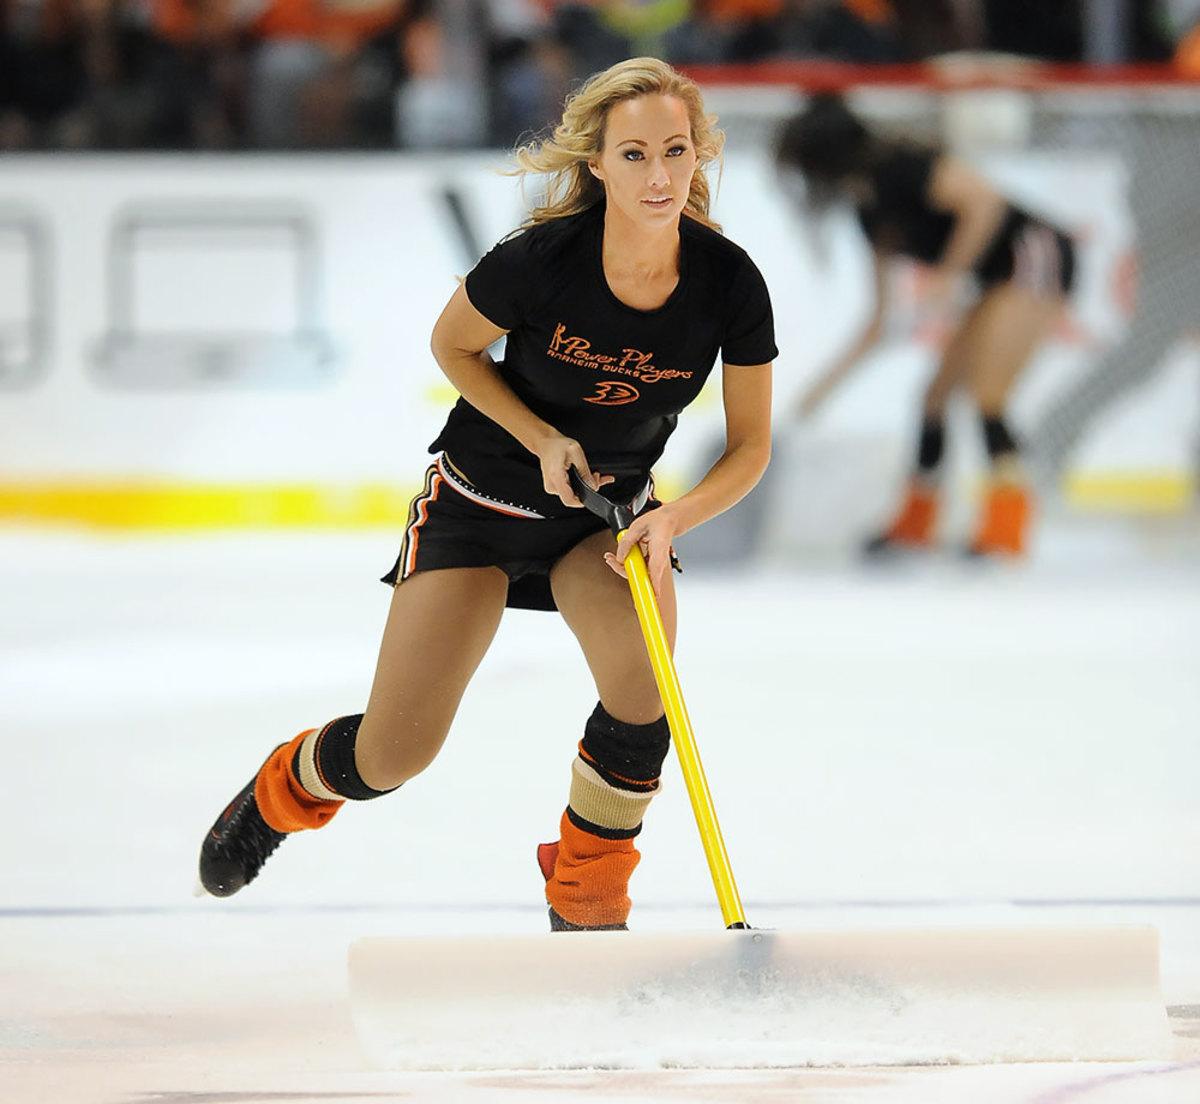 Anaheim-Ducks-Power-Players-Ice-Girls-506151227020_Flyers_at_Ducks.jpg